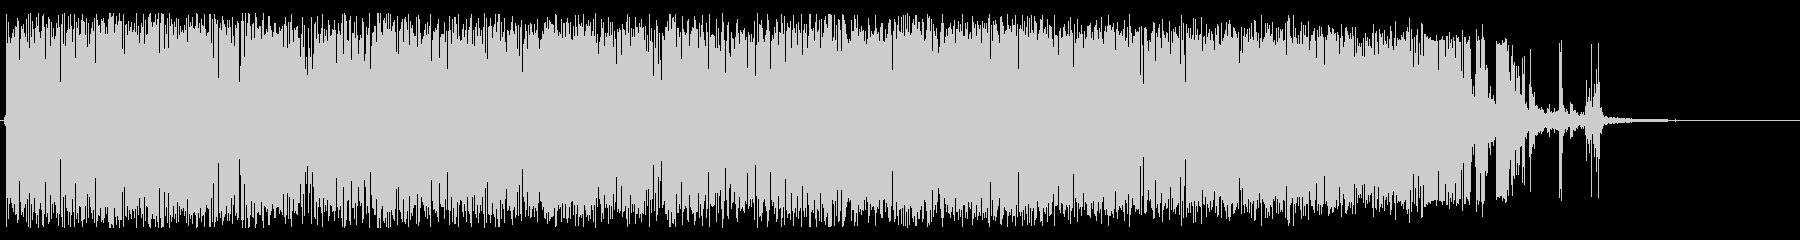 KANT 怪獣が変身する効果音1の未再生の波形